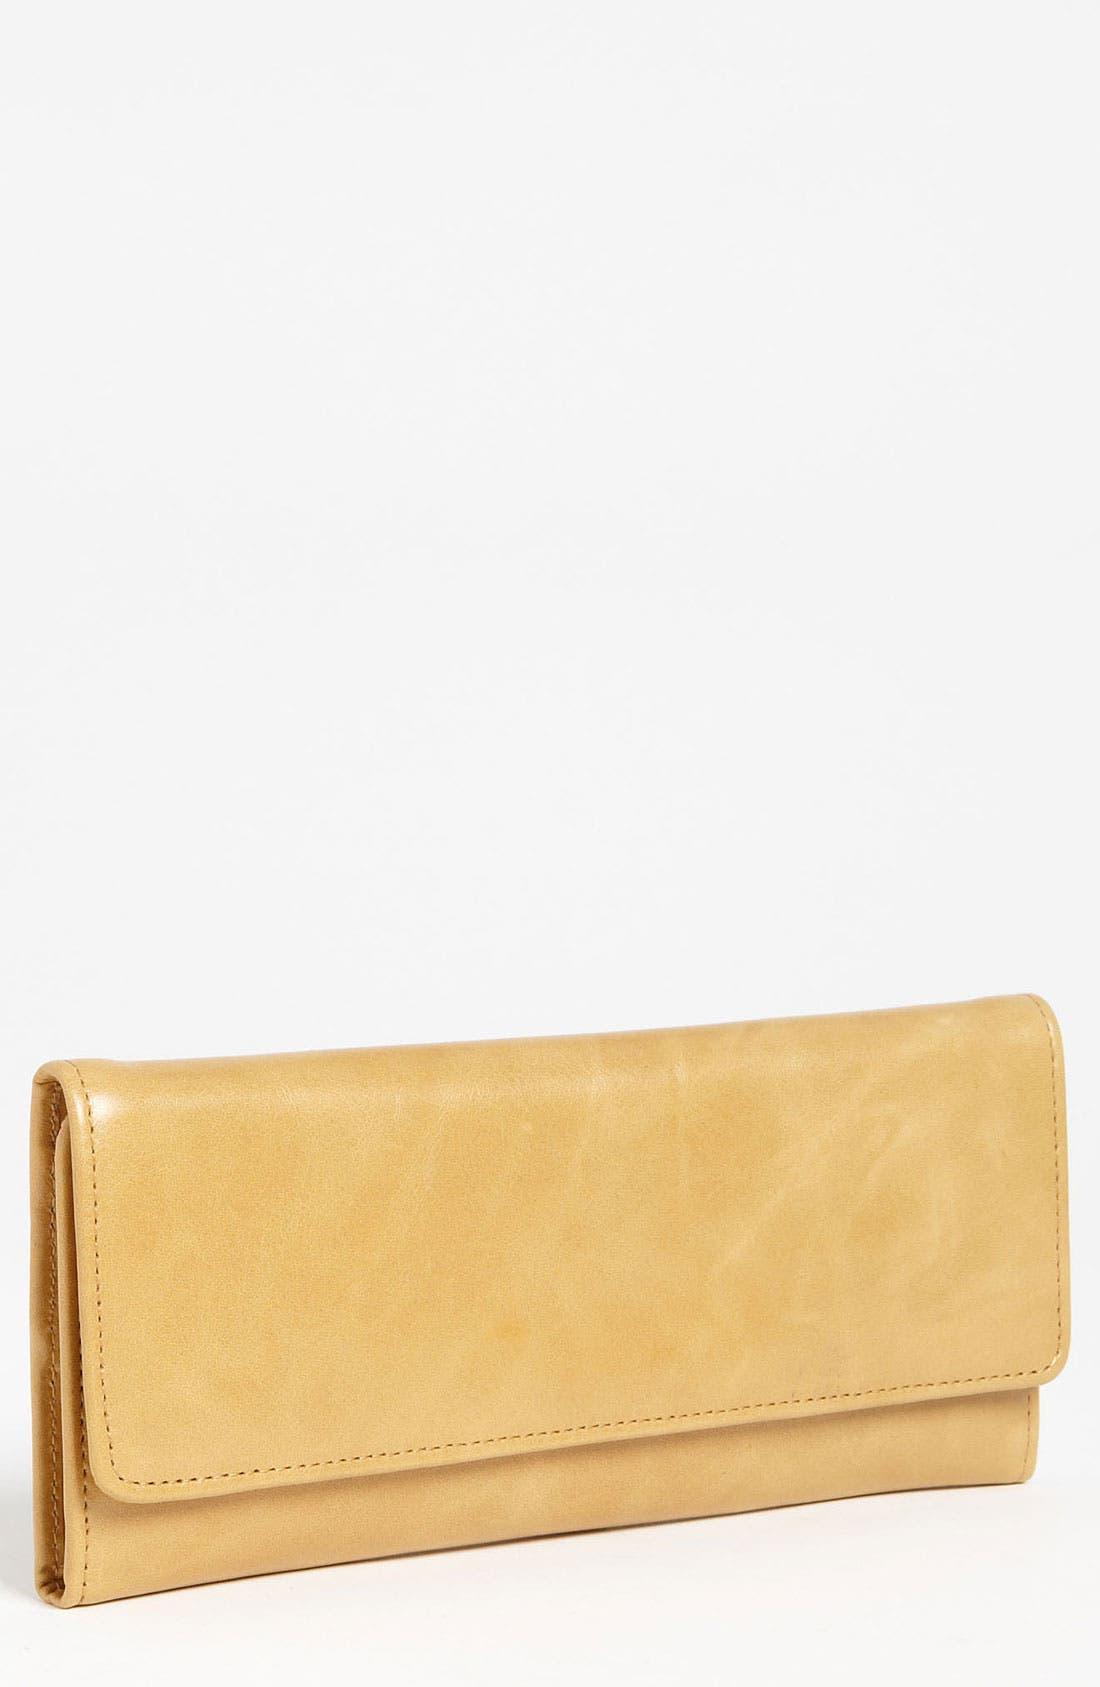 'Sadie' Leather Wallet,                             Main thumbnail 21, color,